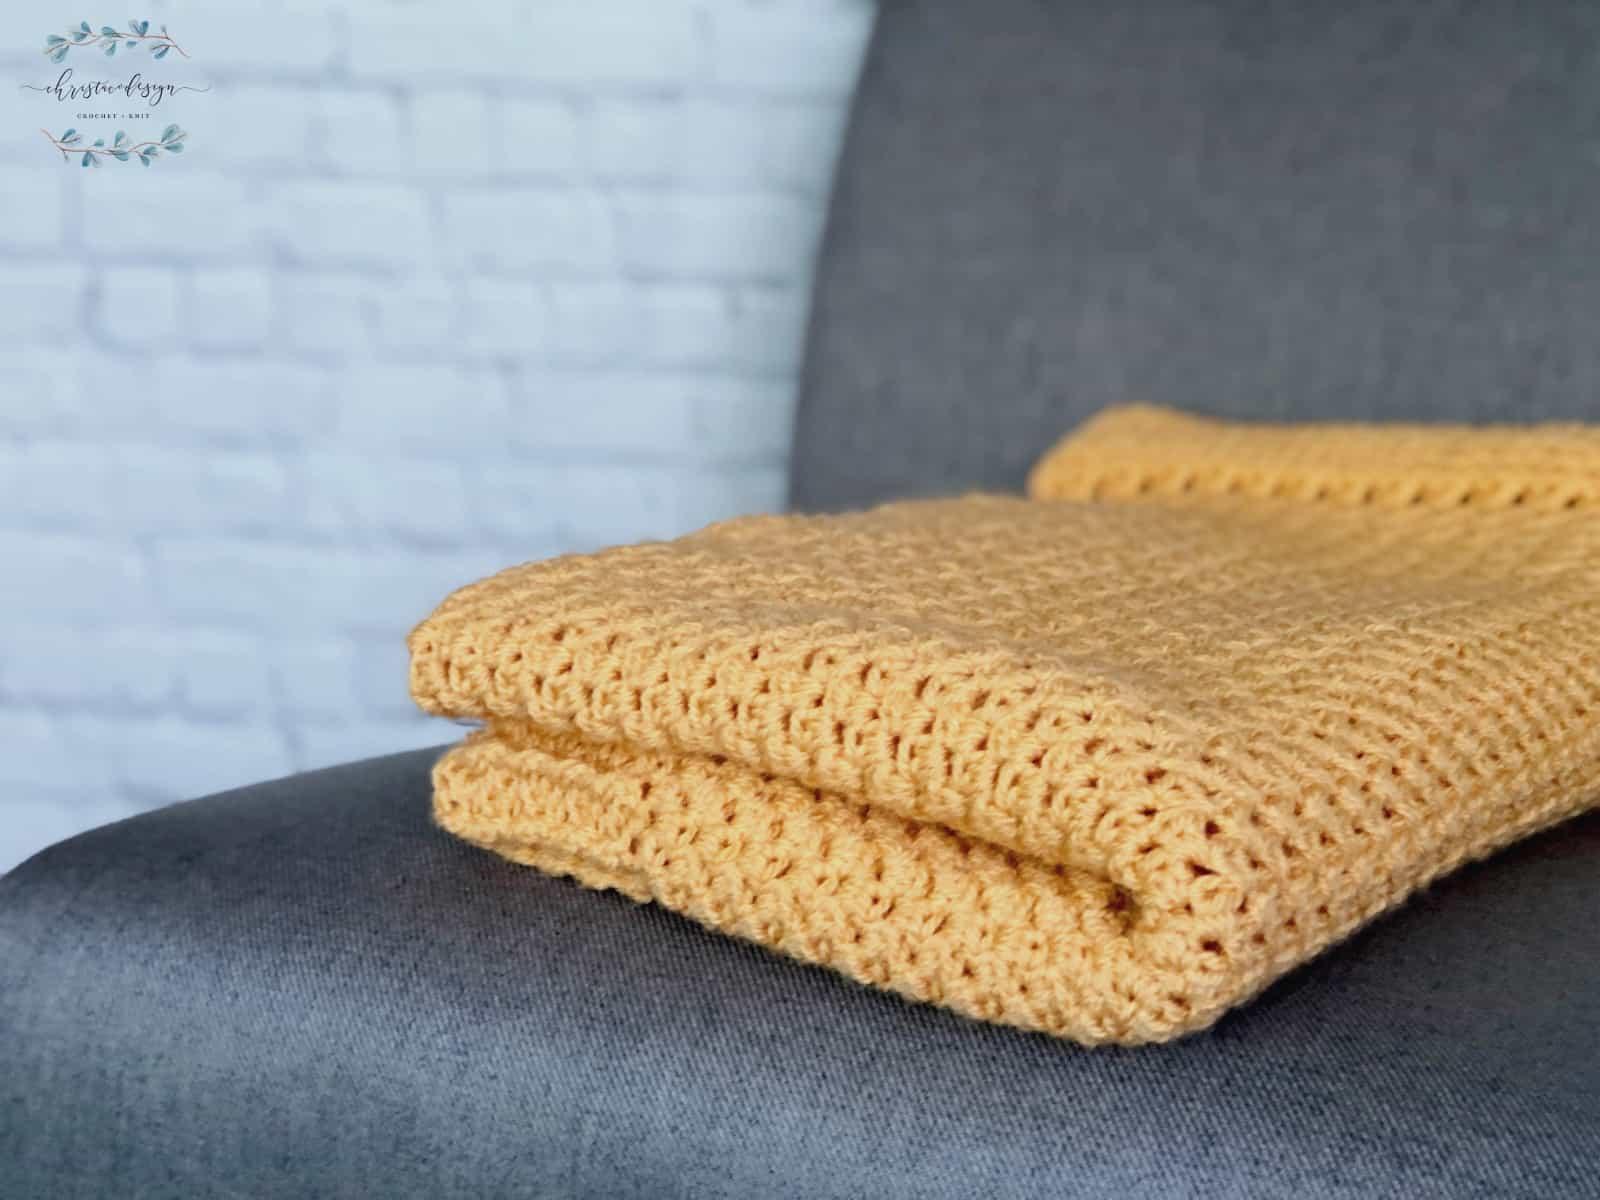 picture of crochet blanket folded